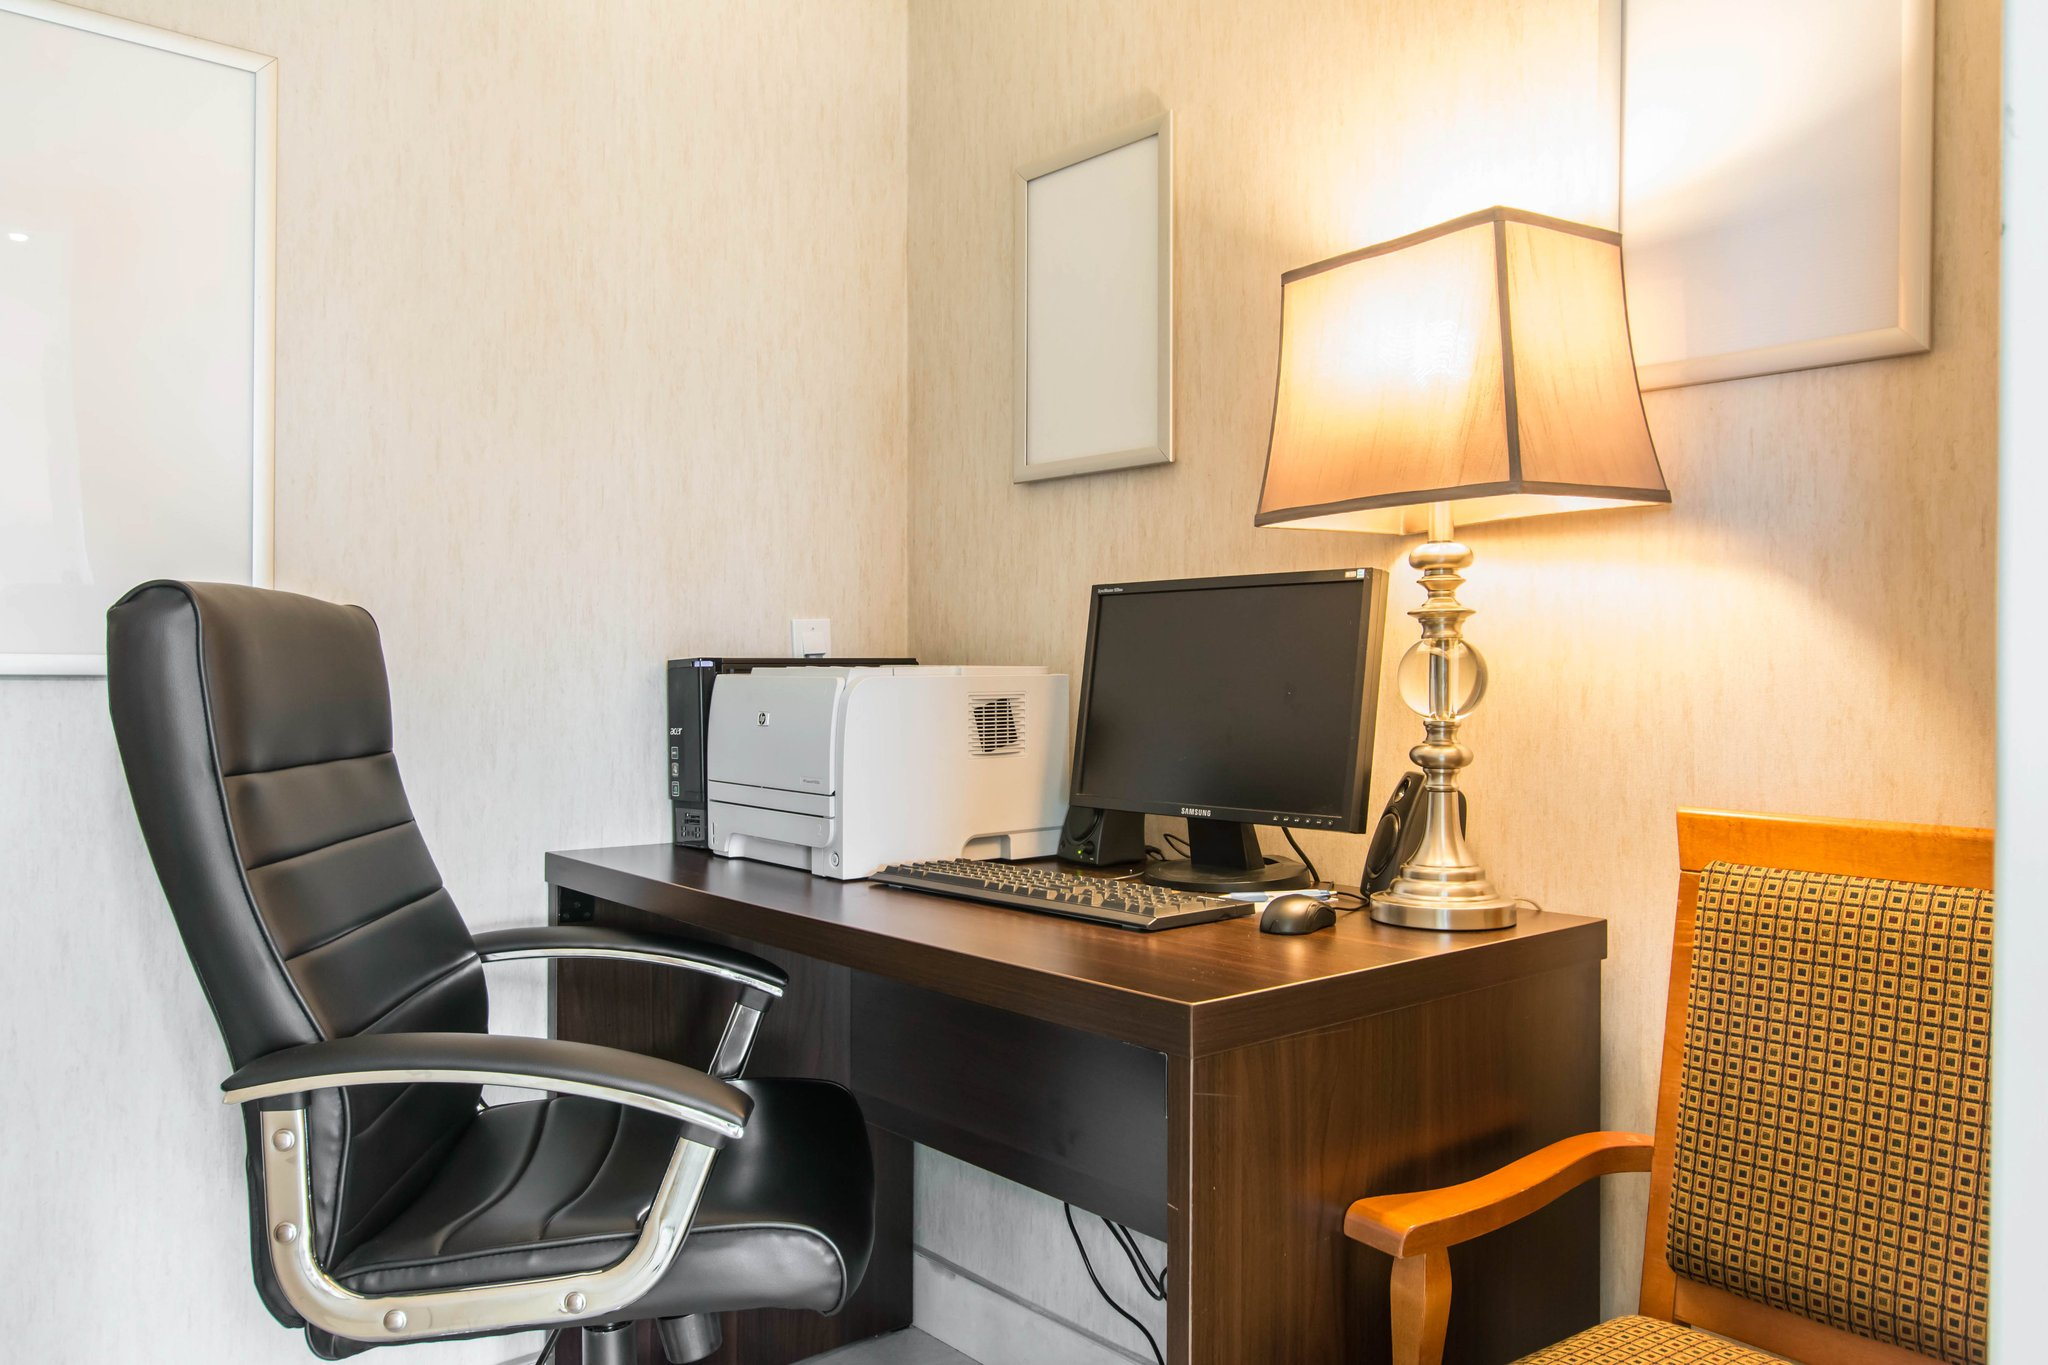 Hotel Suite Laviolette